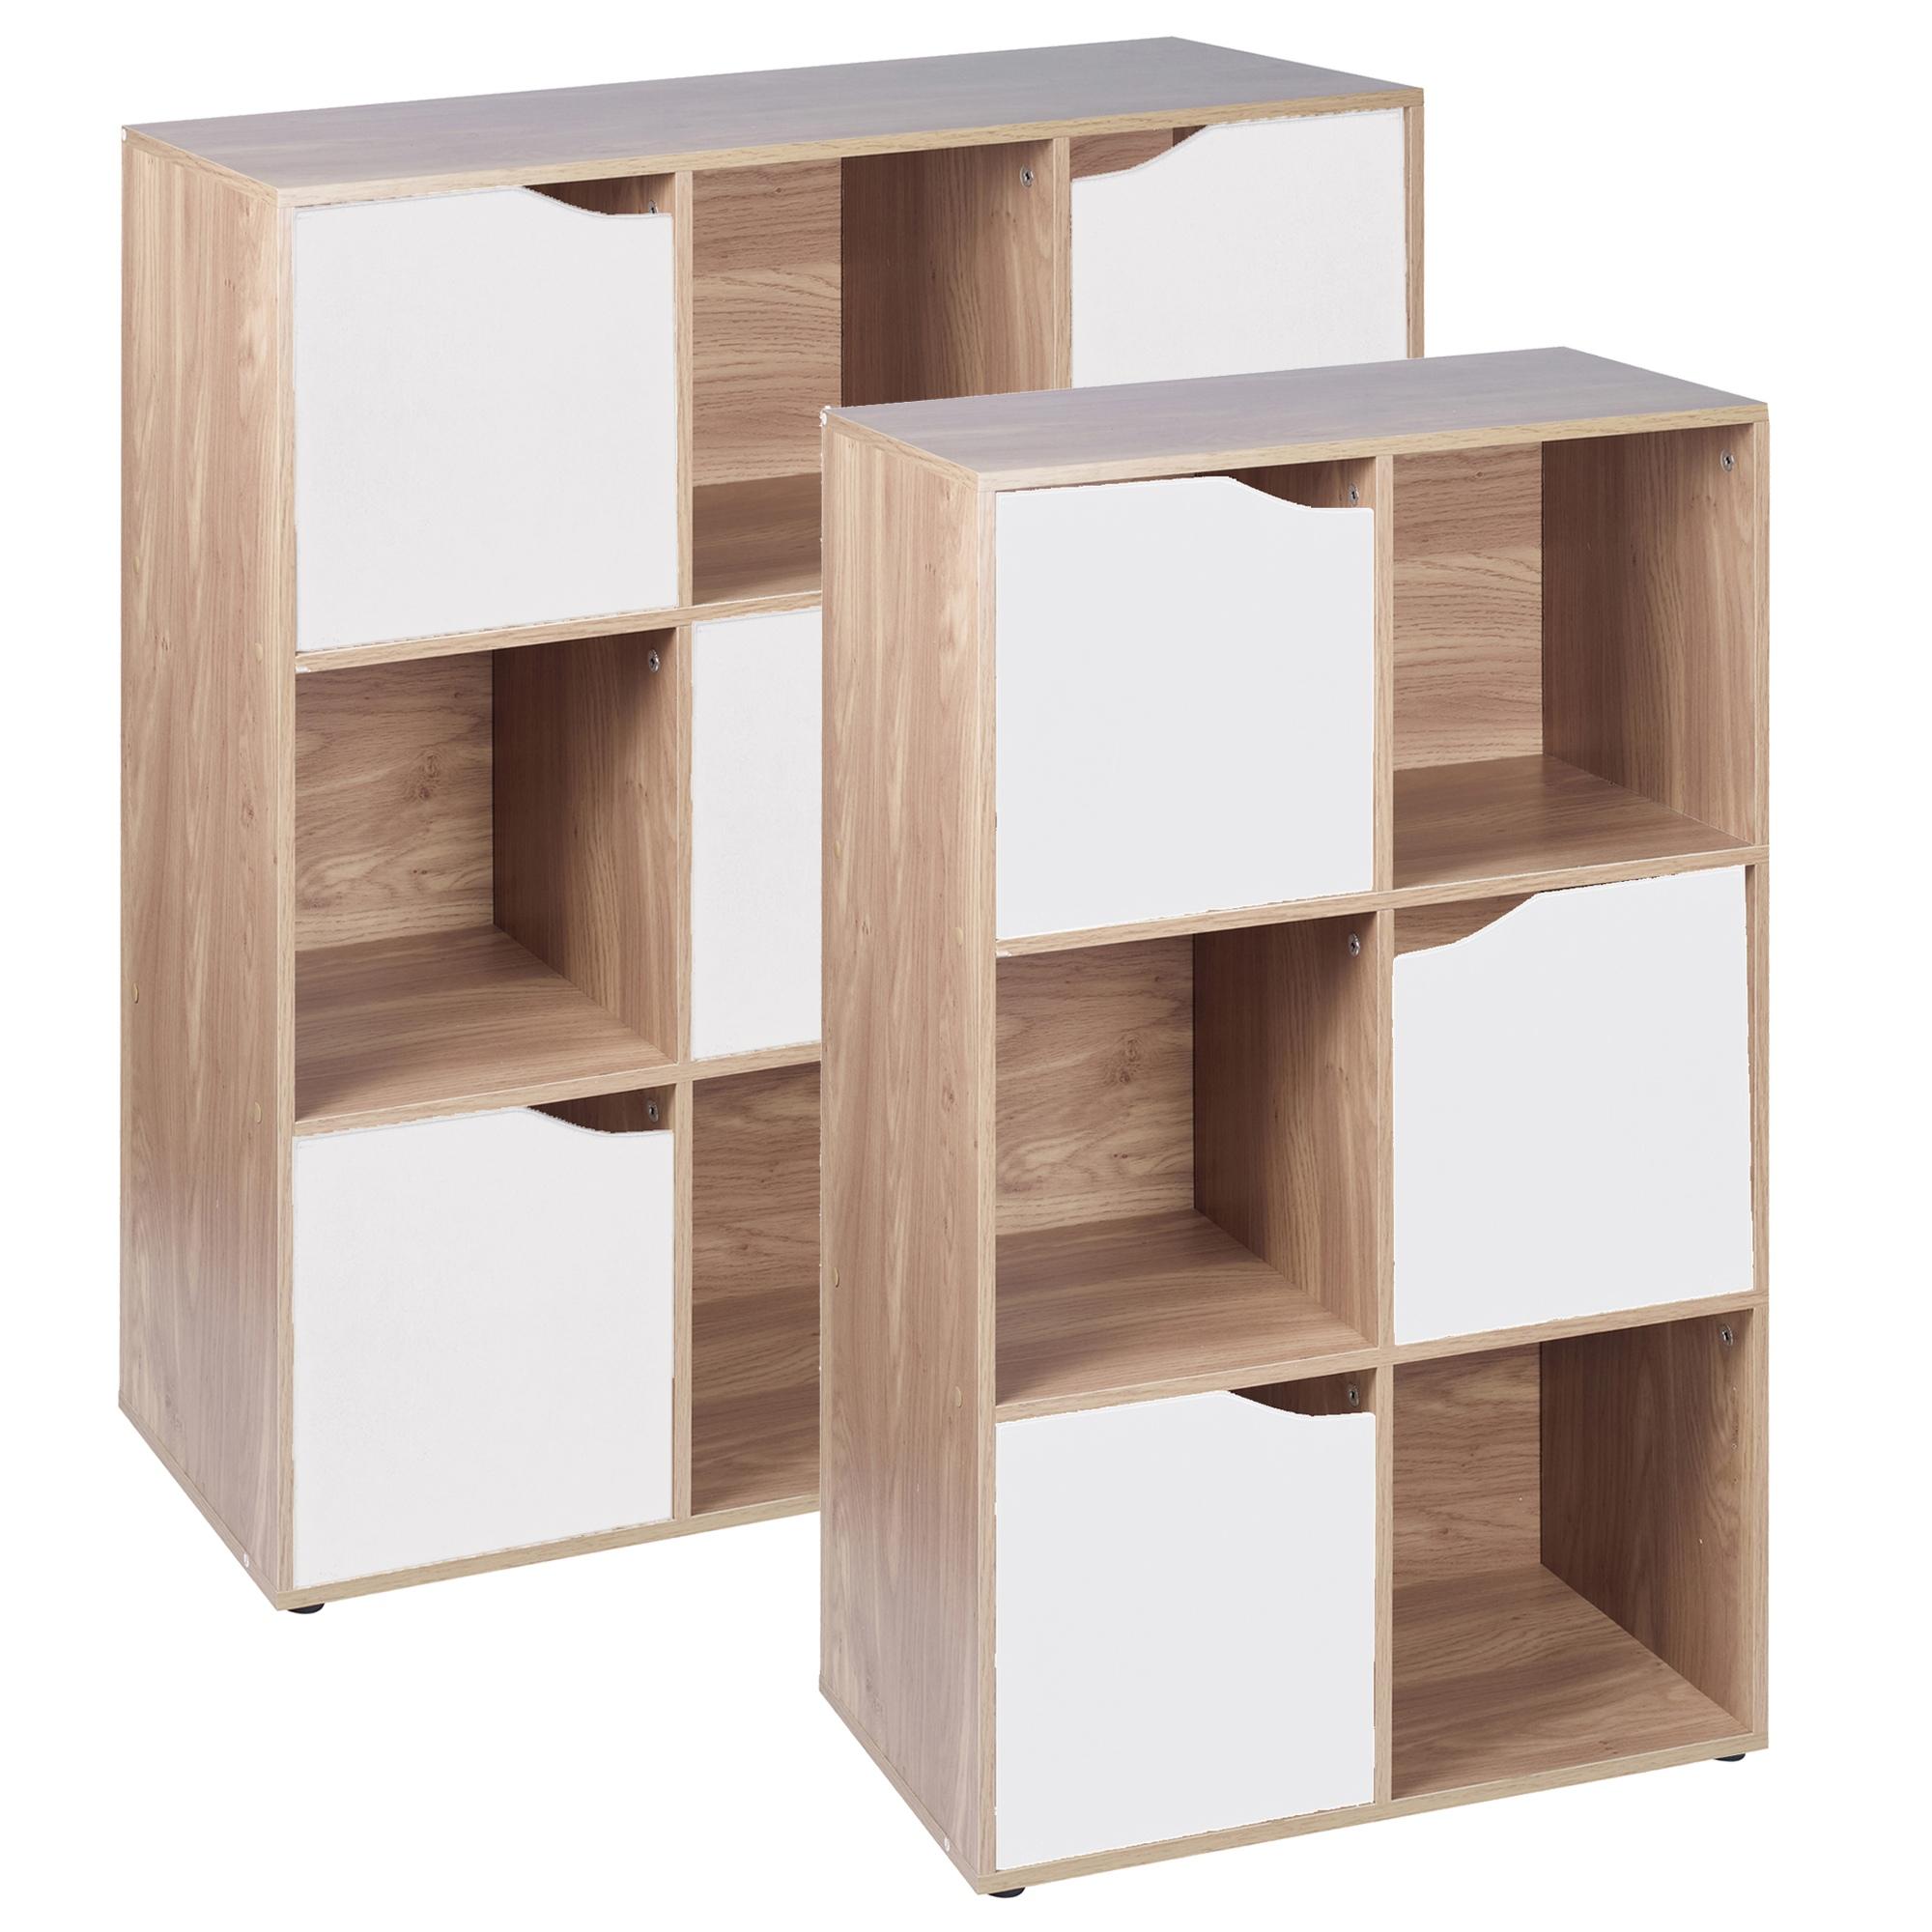 New Bookcase Toy Box White Finish Bedroom Playroom Child: 6,9 Cube Oak Modular Bookcase Shelving Display Shelf